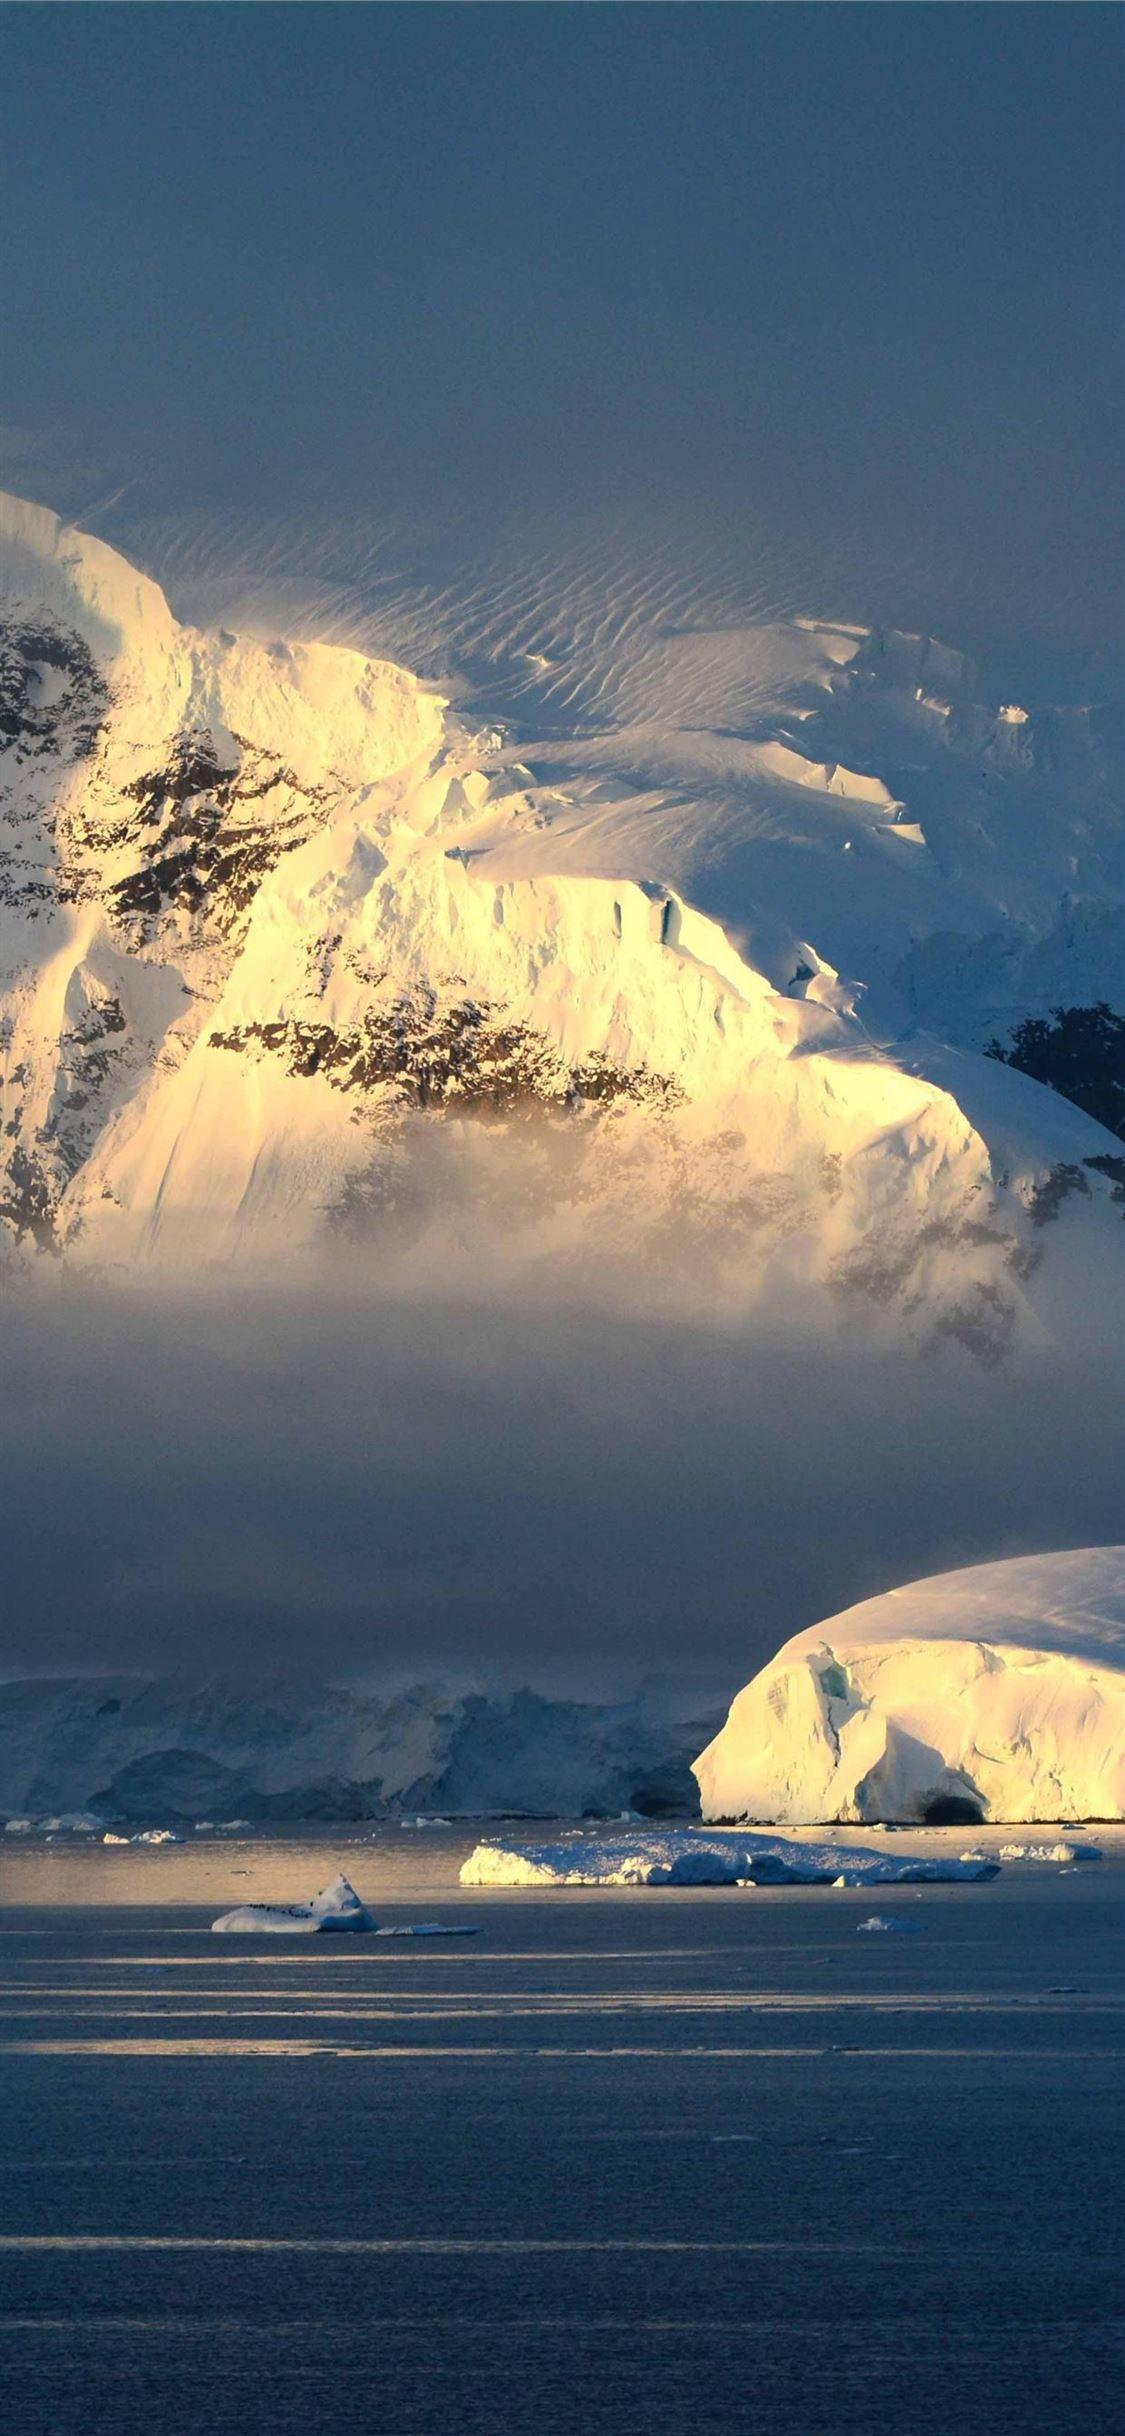 Antarctica 4k 5k 8k hd antarctica